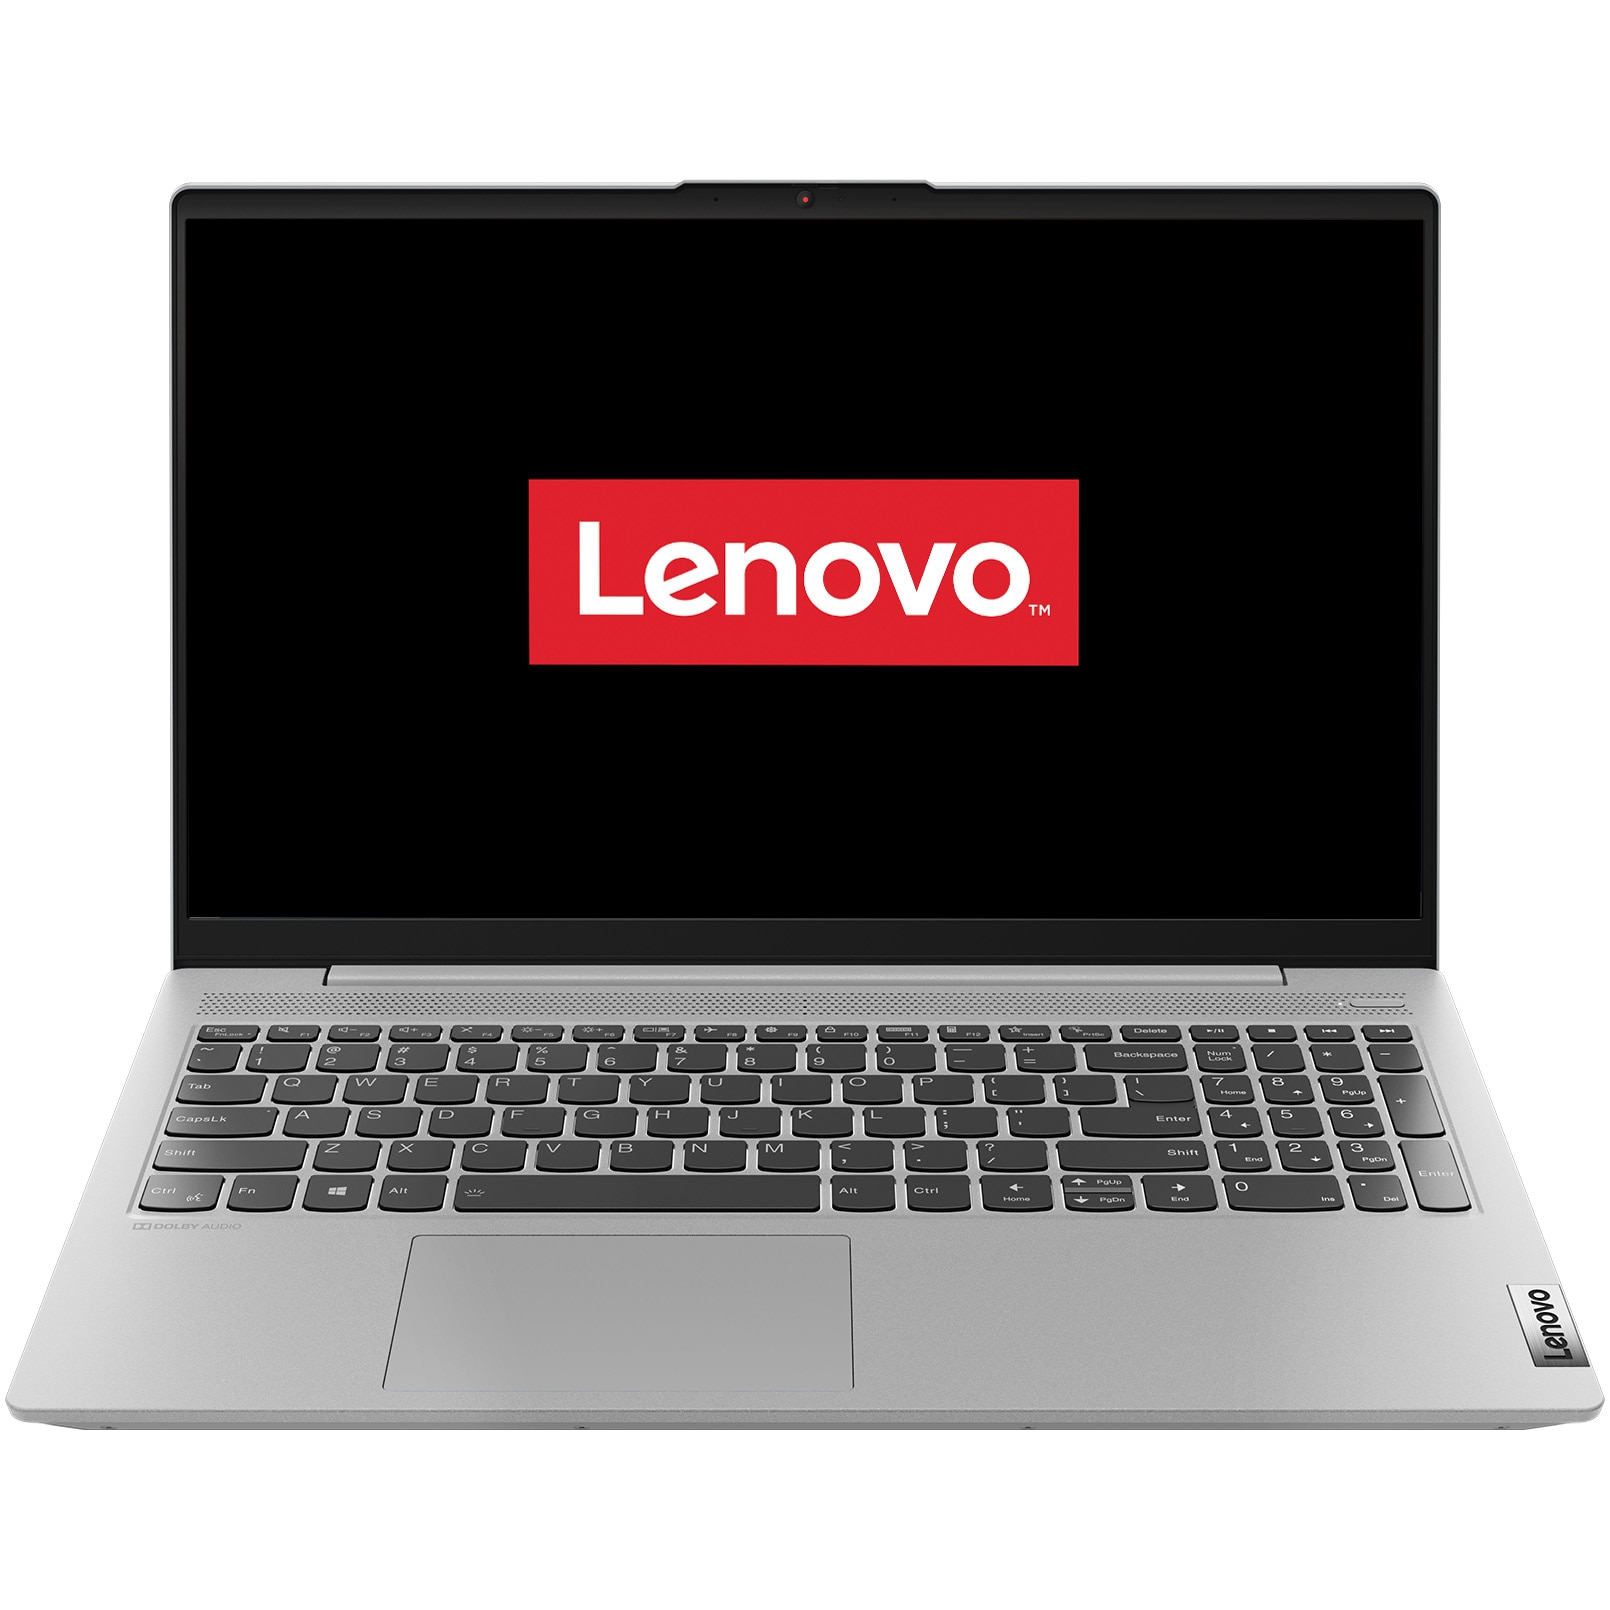 "Fotografie Laptop ultraportabil Lenovo IdeaPad 5 15ARE05 cu procesor AMD Ryzen 3 4300U pana la 3.70 GHz, 15.6"", Full HD, 8GB, 256GB SSD, AMD Radeon Graphics, Free DOS, Platinum Grey"